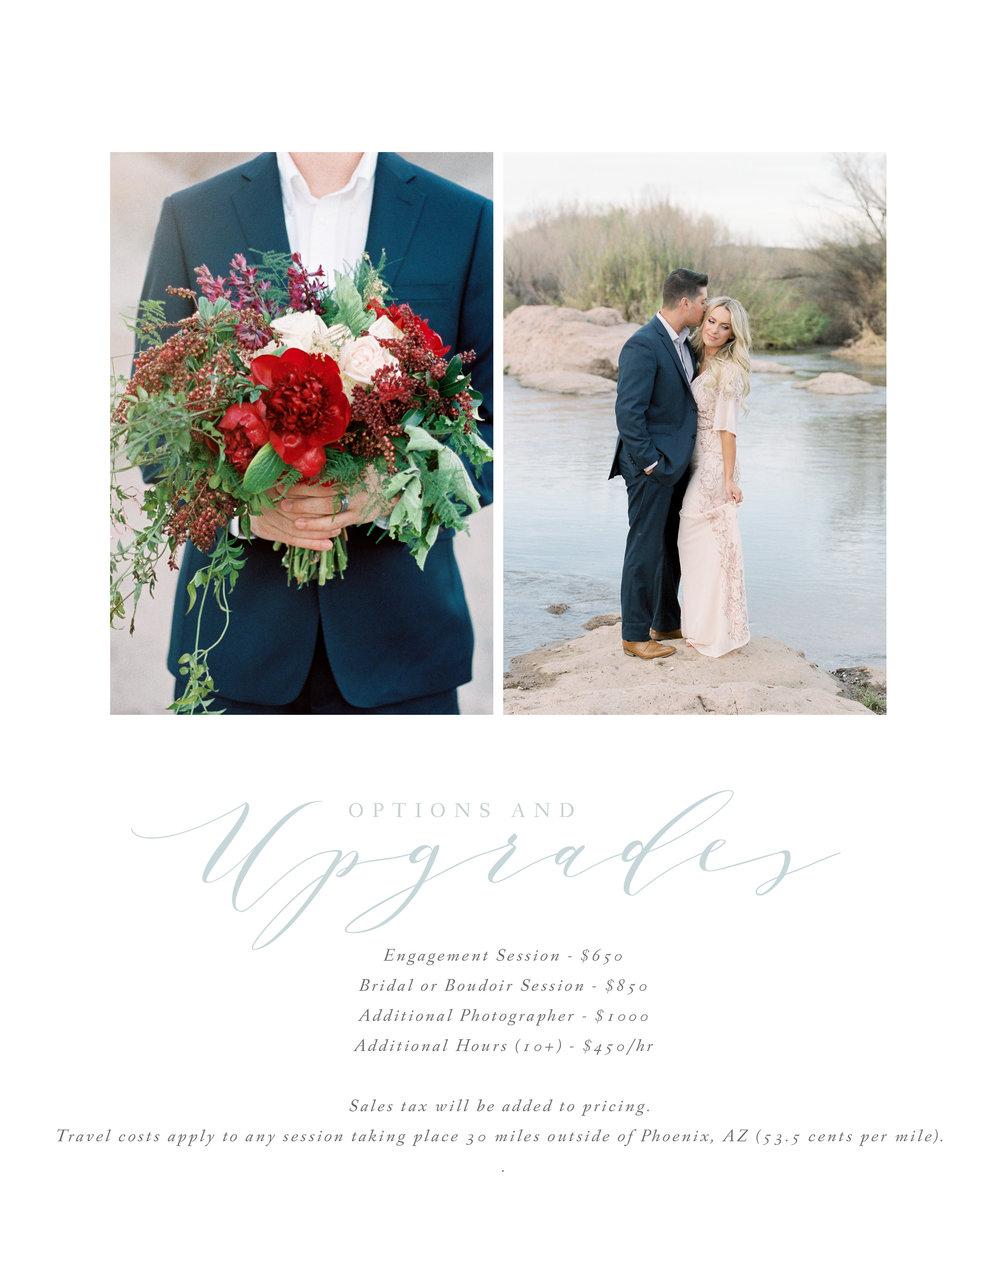 7Sarah Jane Photography Wedding Pricing 2017-2018.jpg